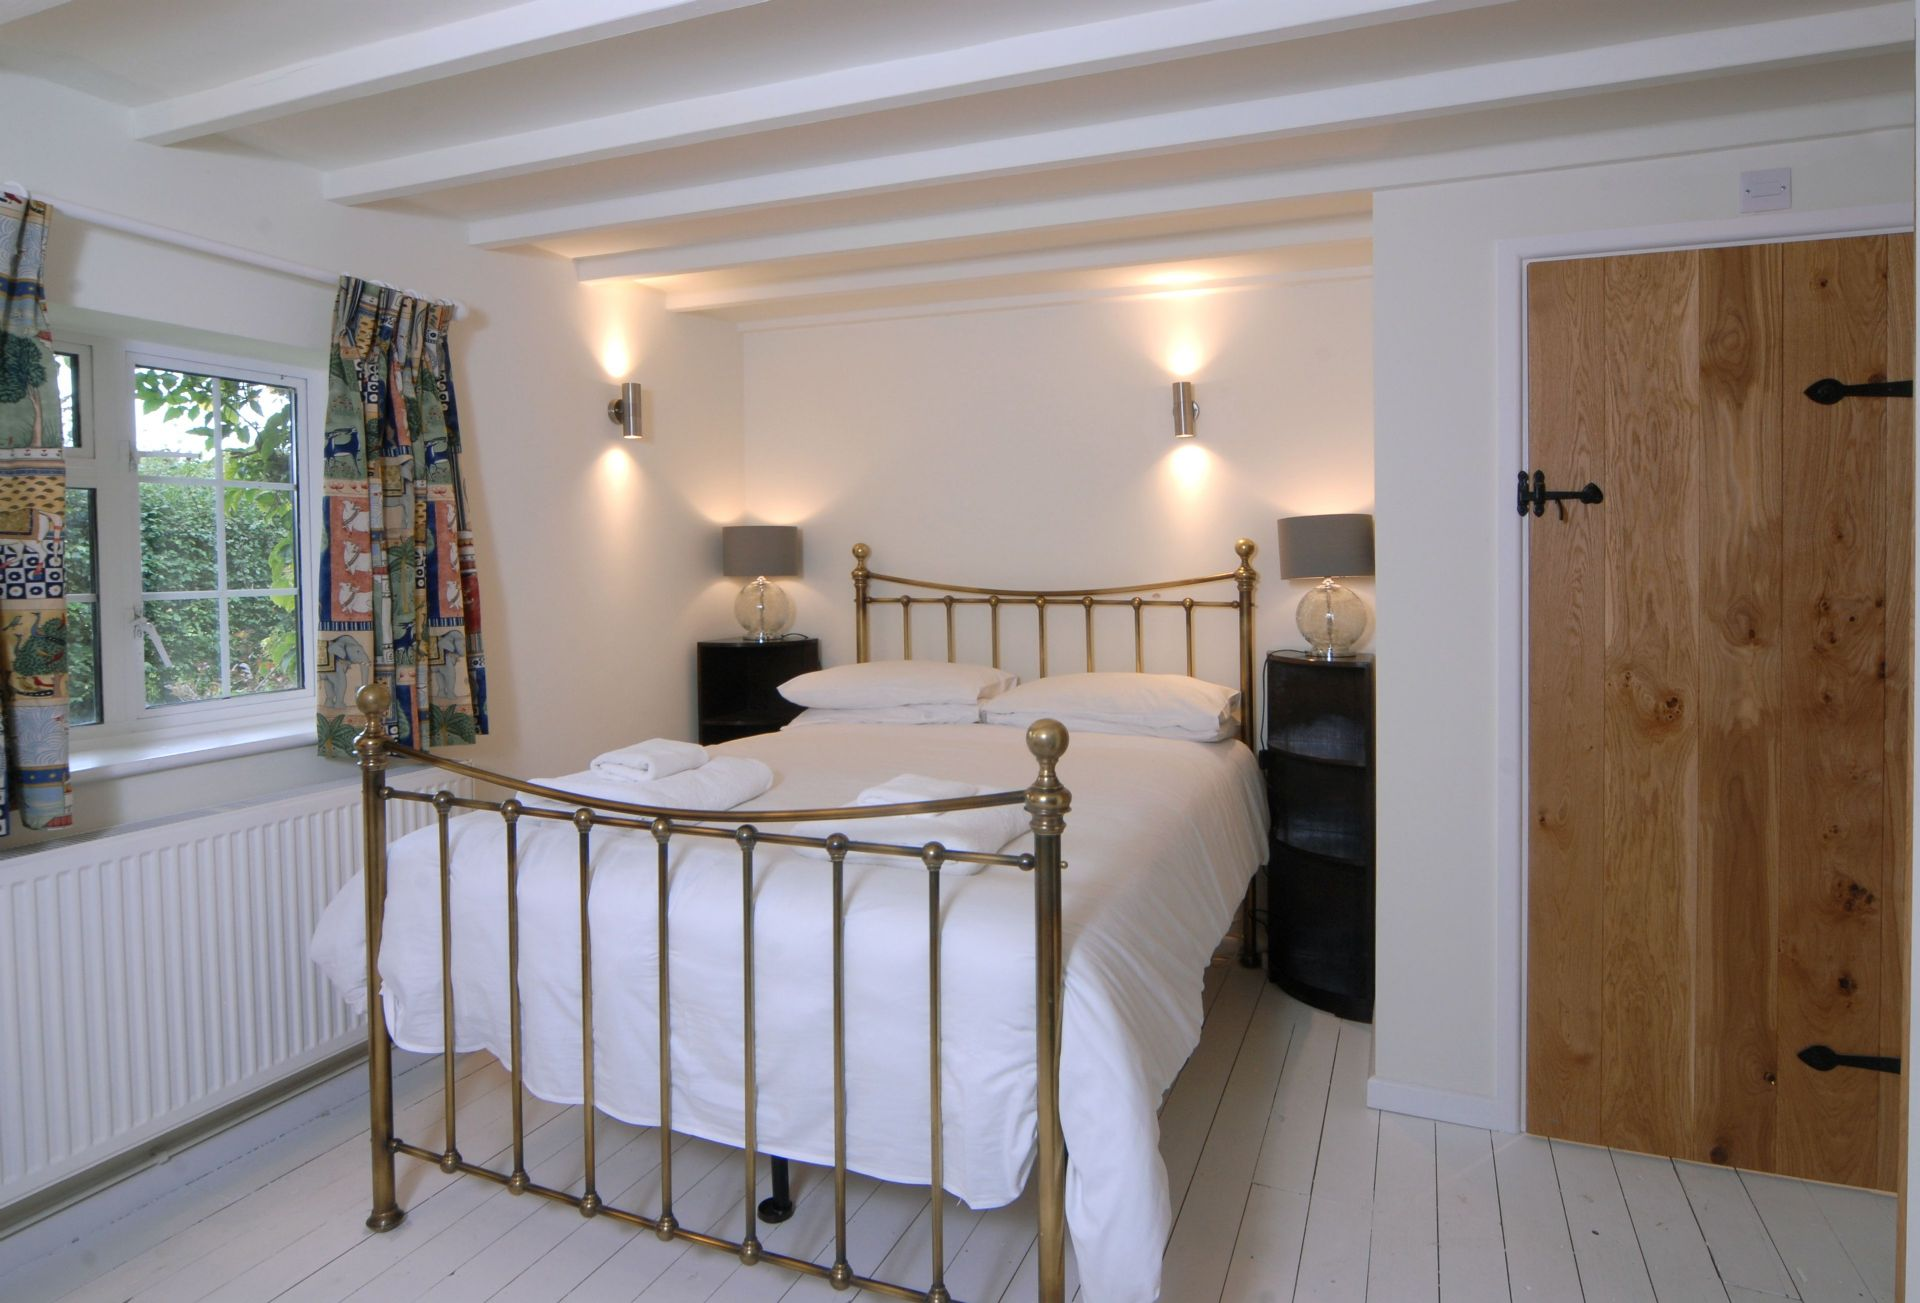 Hiron's Piece Ground floor: Bedroom one with double bed